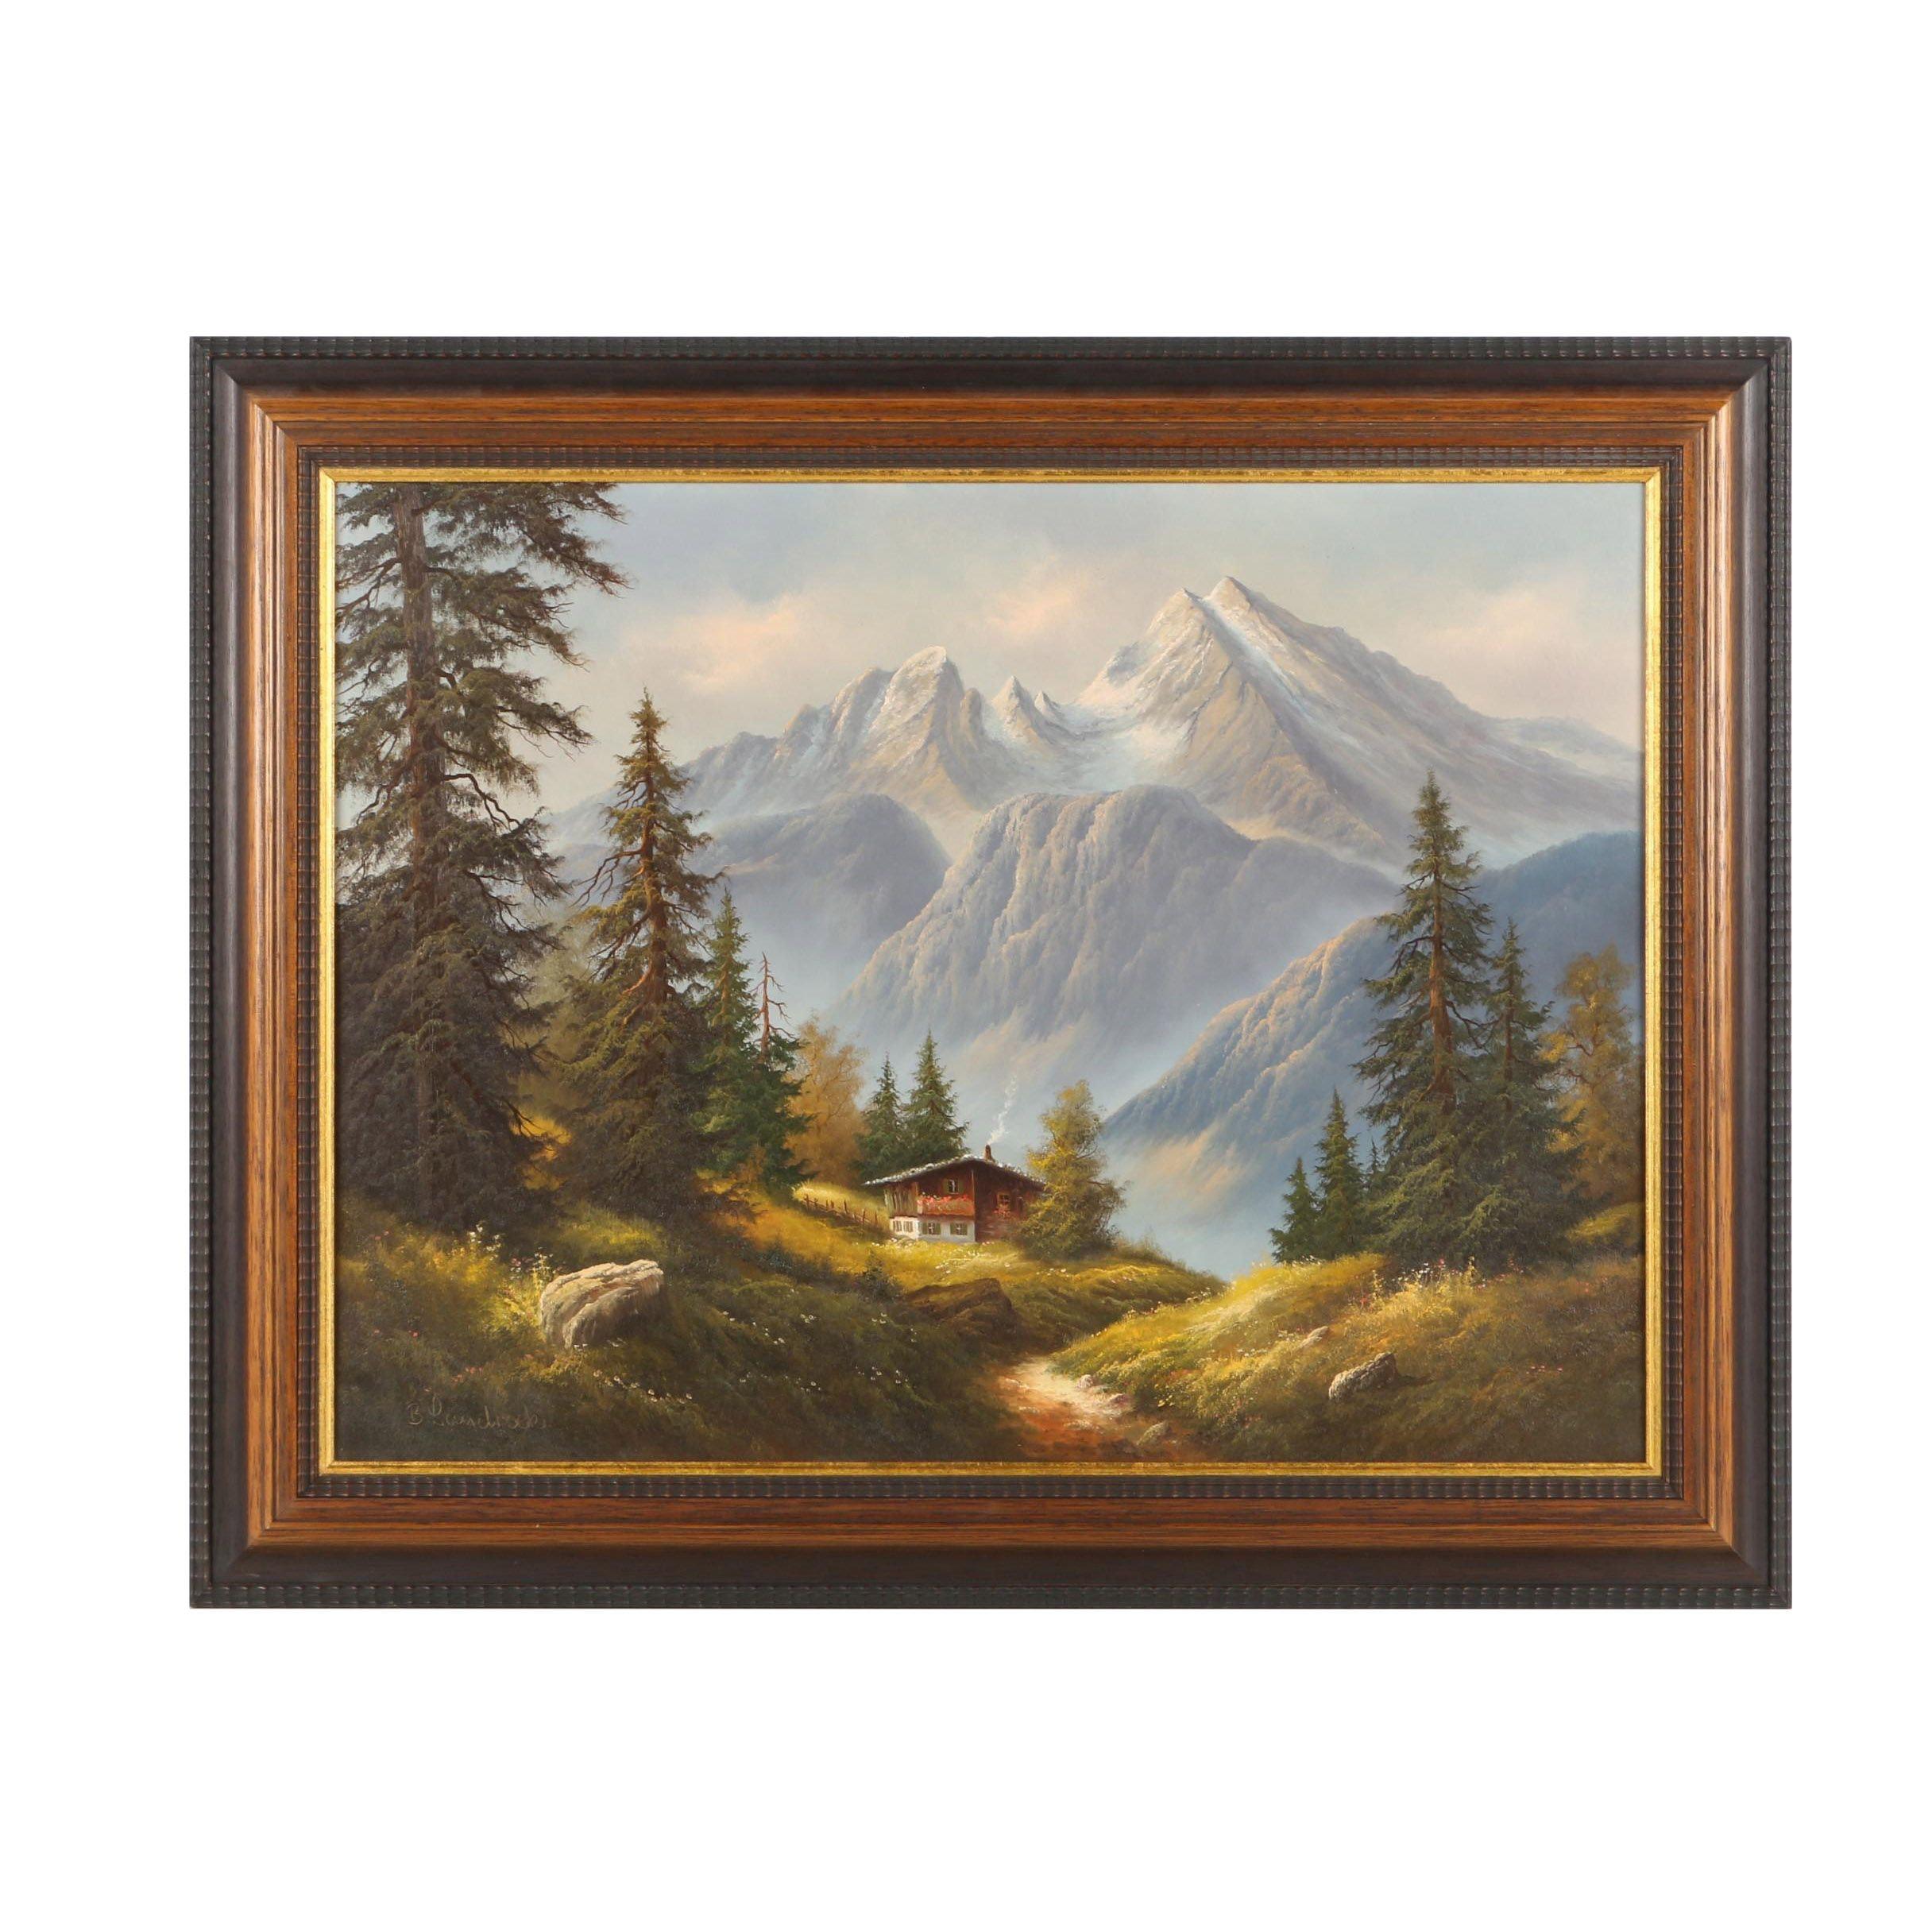 B. Landrock Oil Painting on Canvas of Landscape